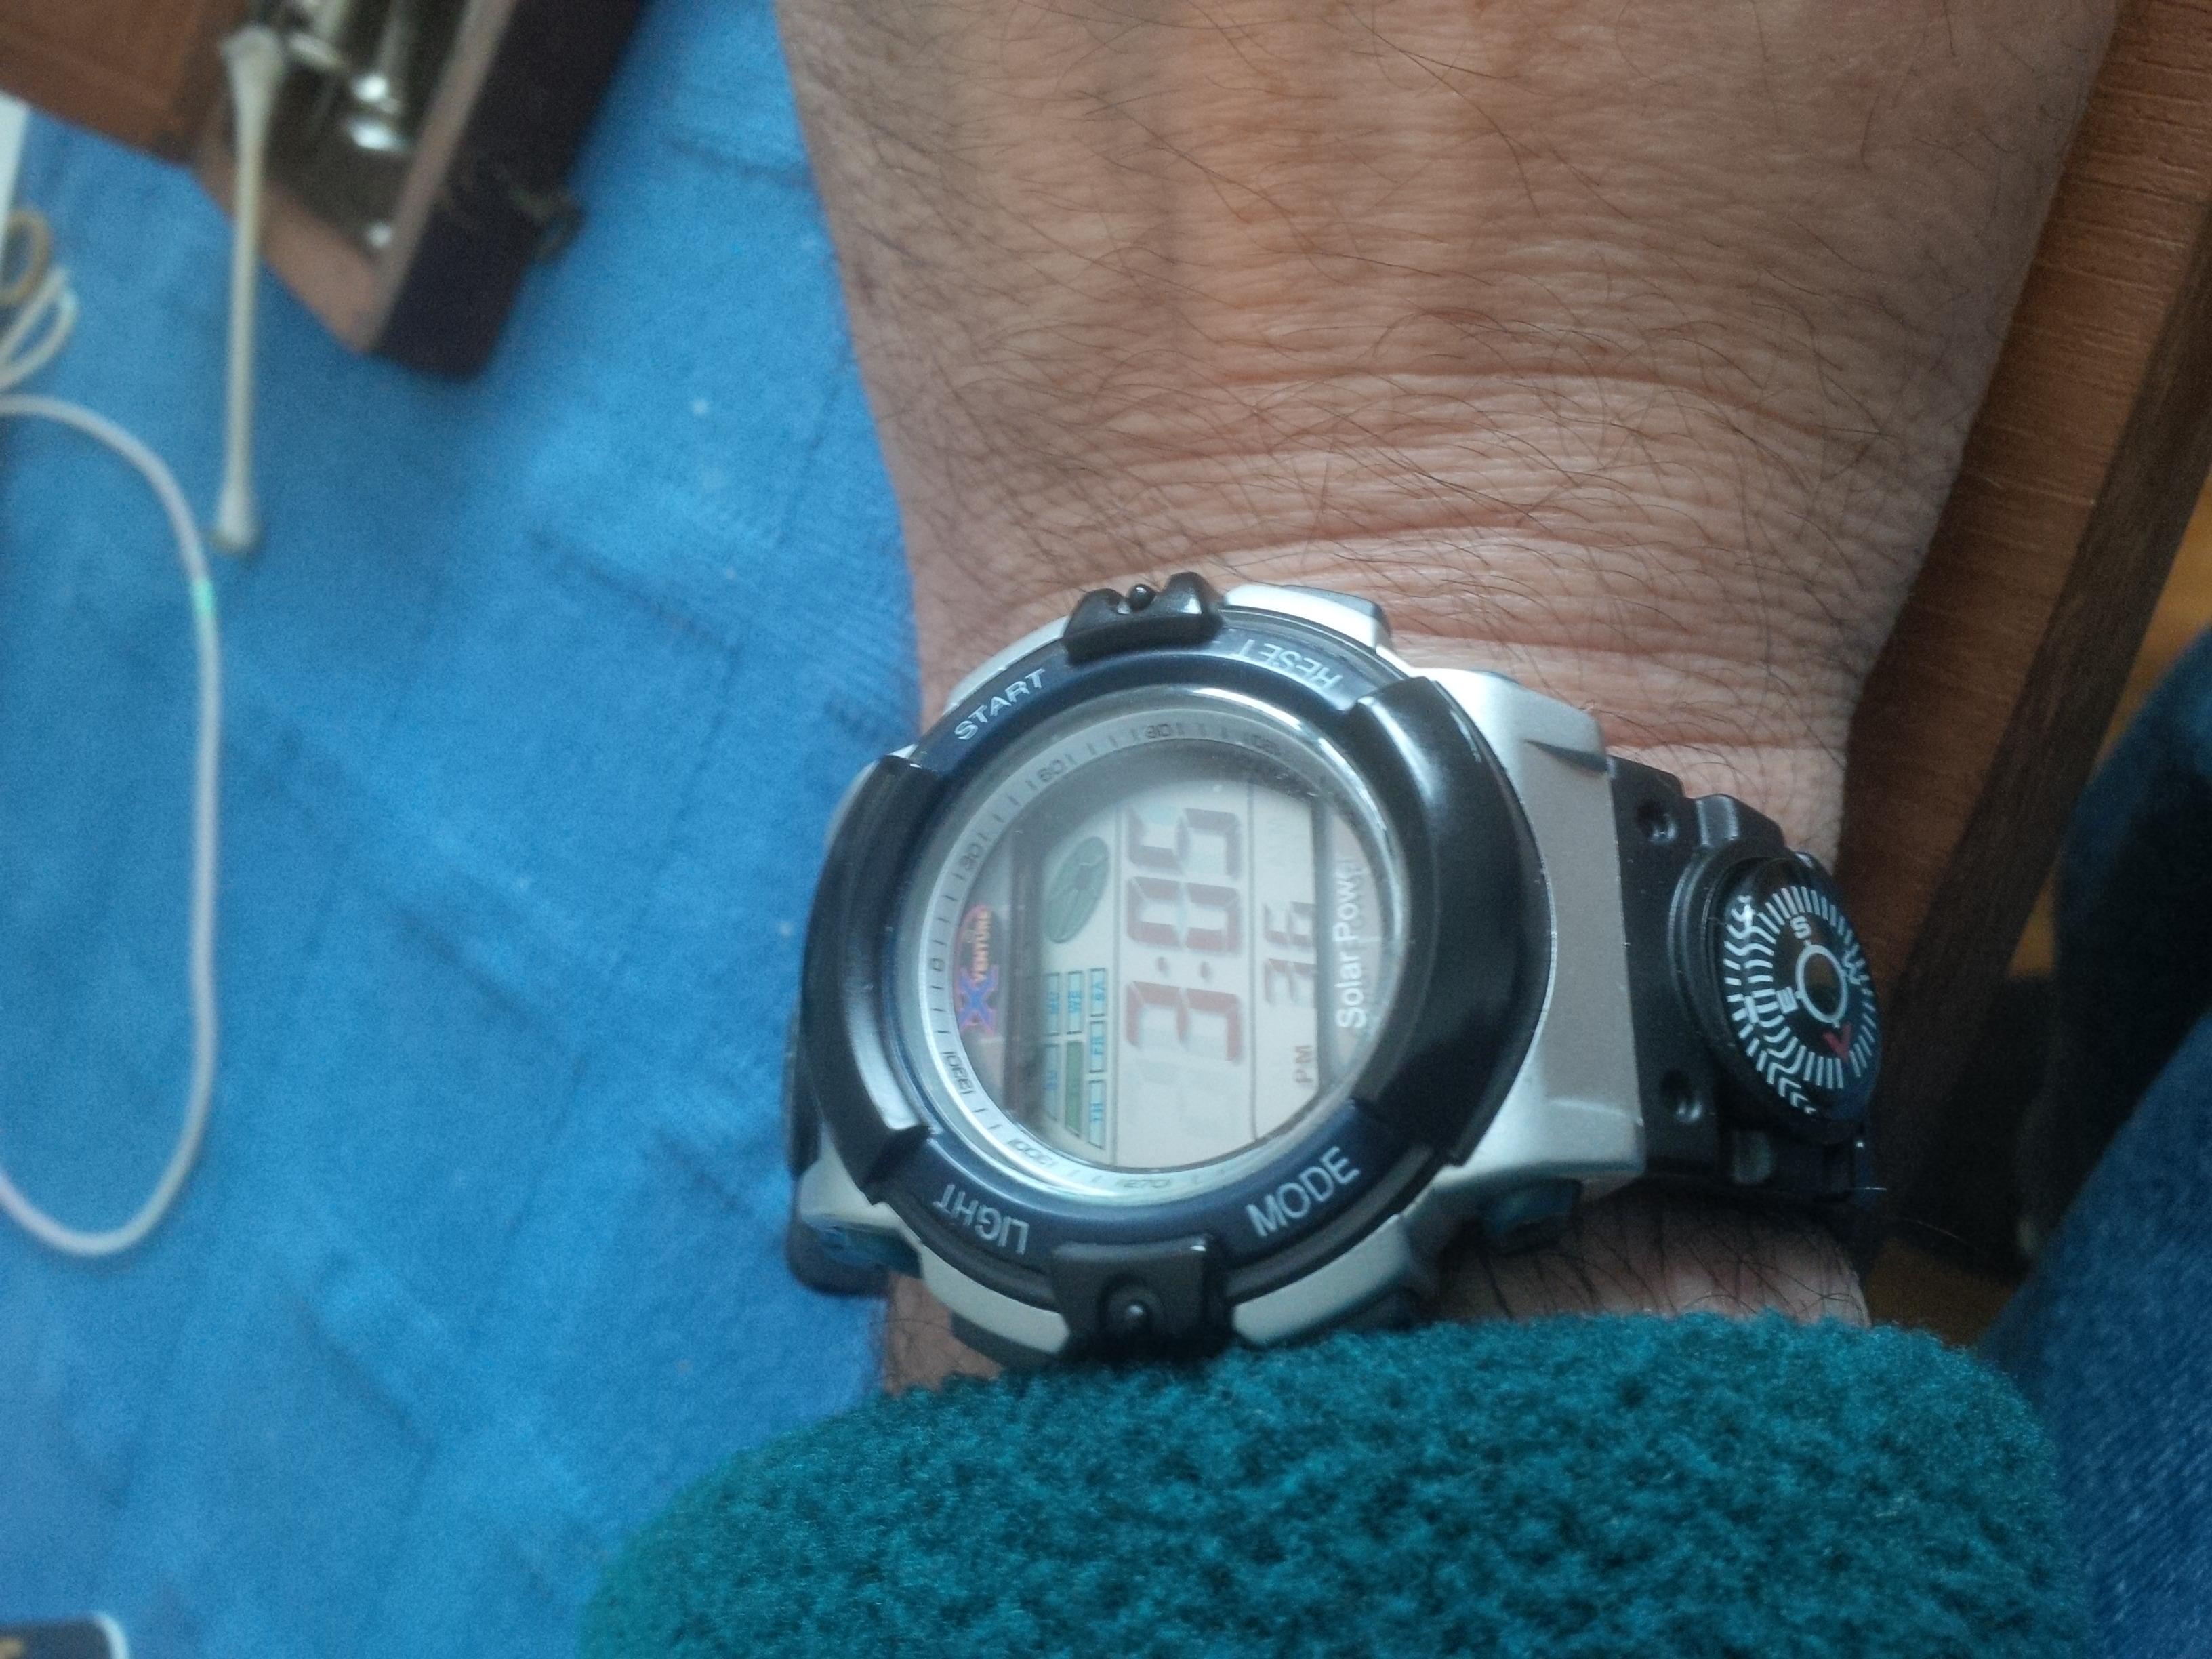 Name:  Xventure watch.jpg Views: 118 Size:  1.67 MB